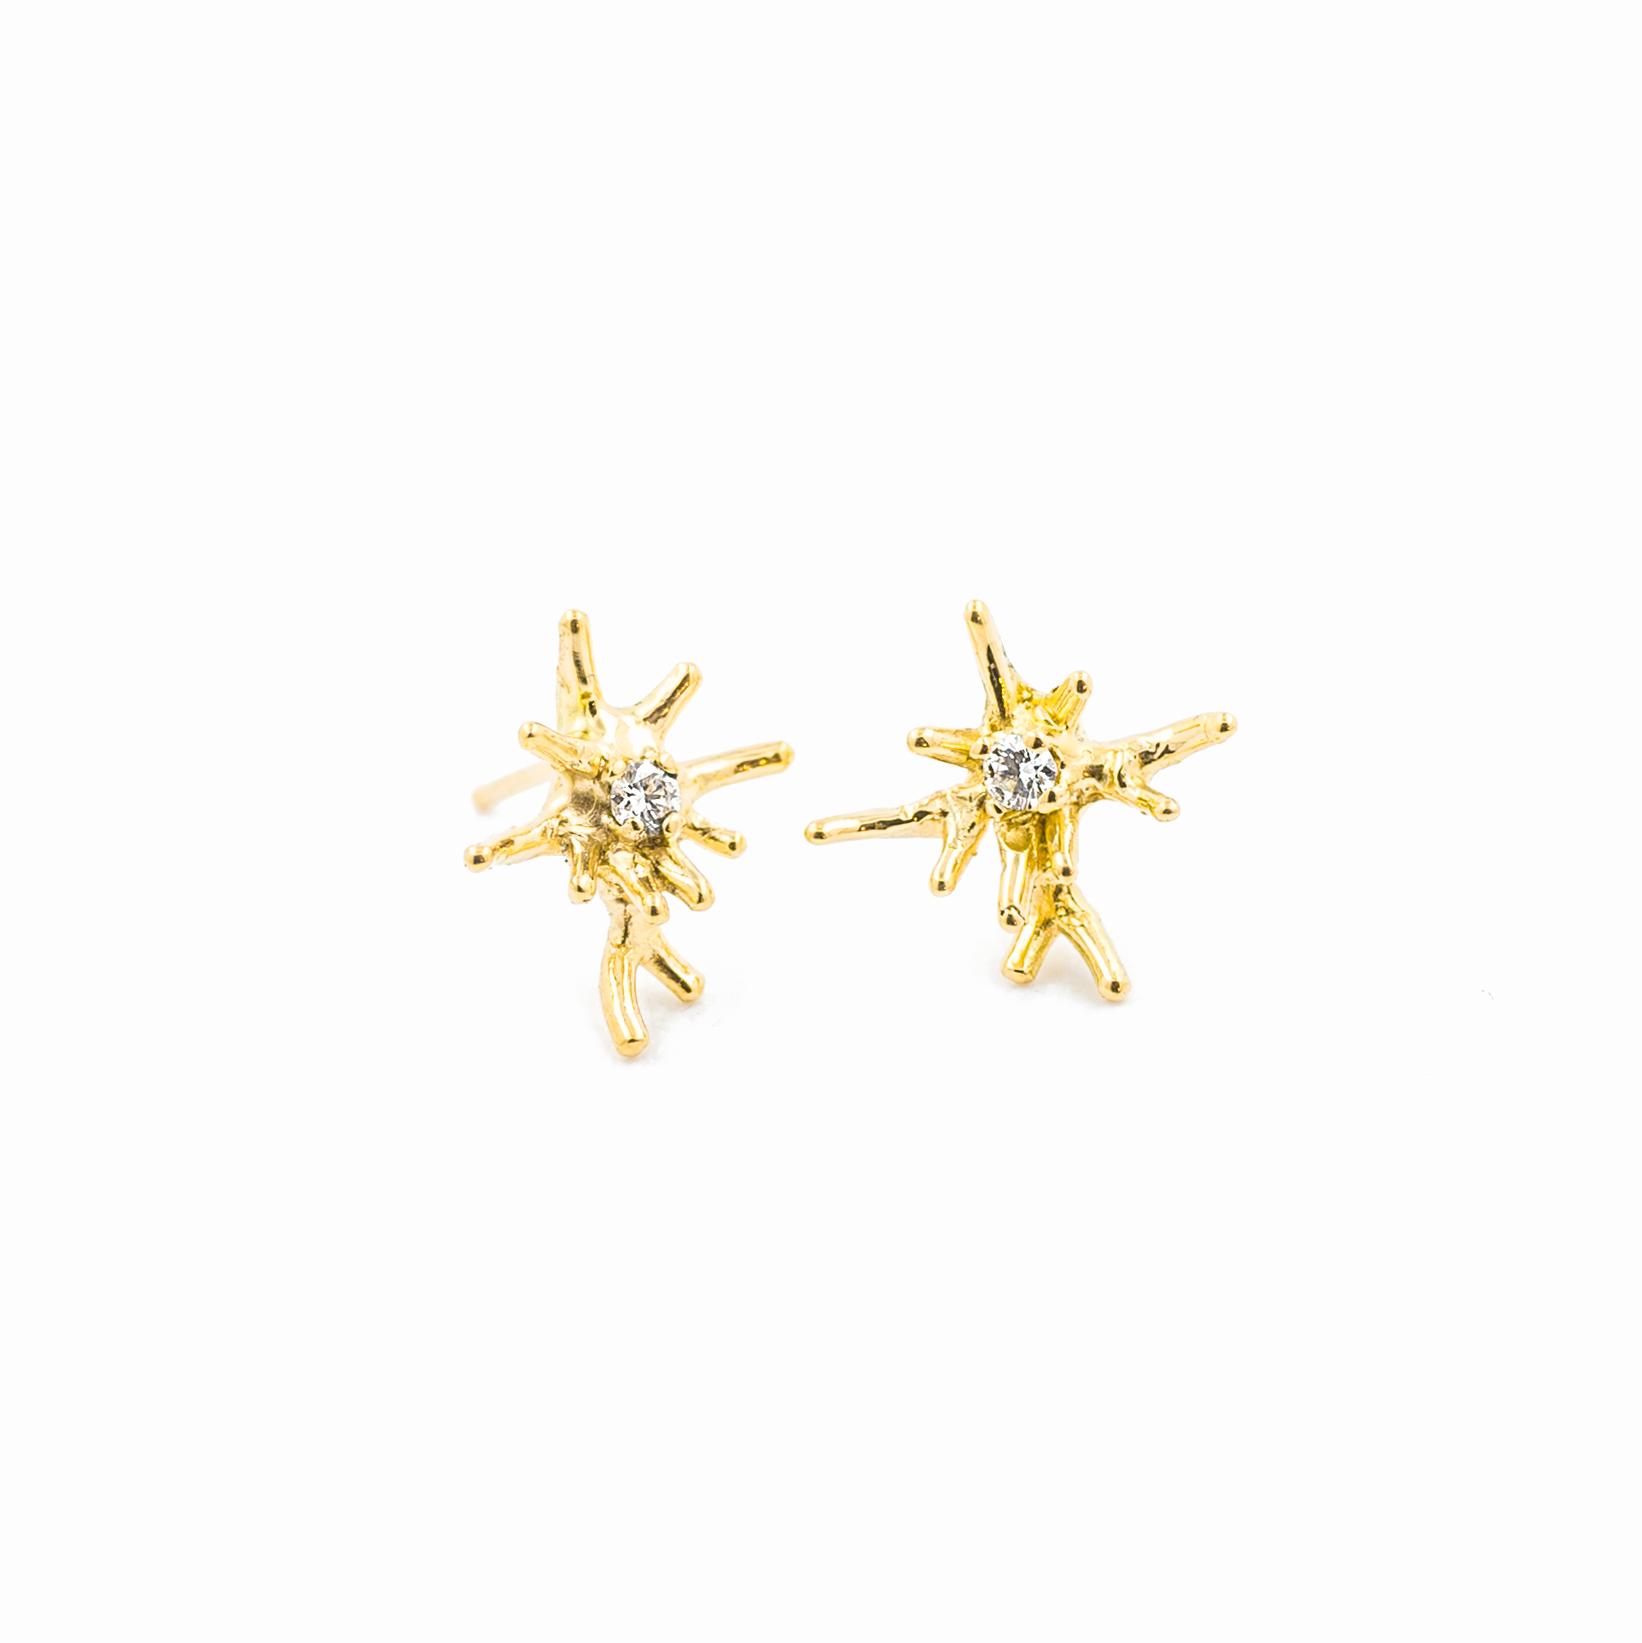 Unfolding Earrings:  18ct yellow gold, brilliant white diamonds